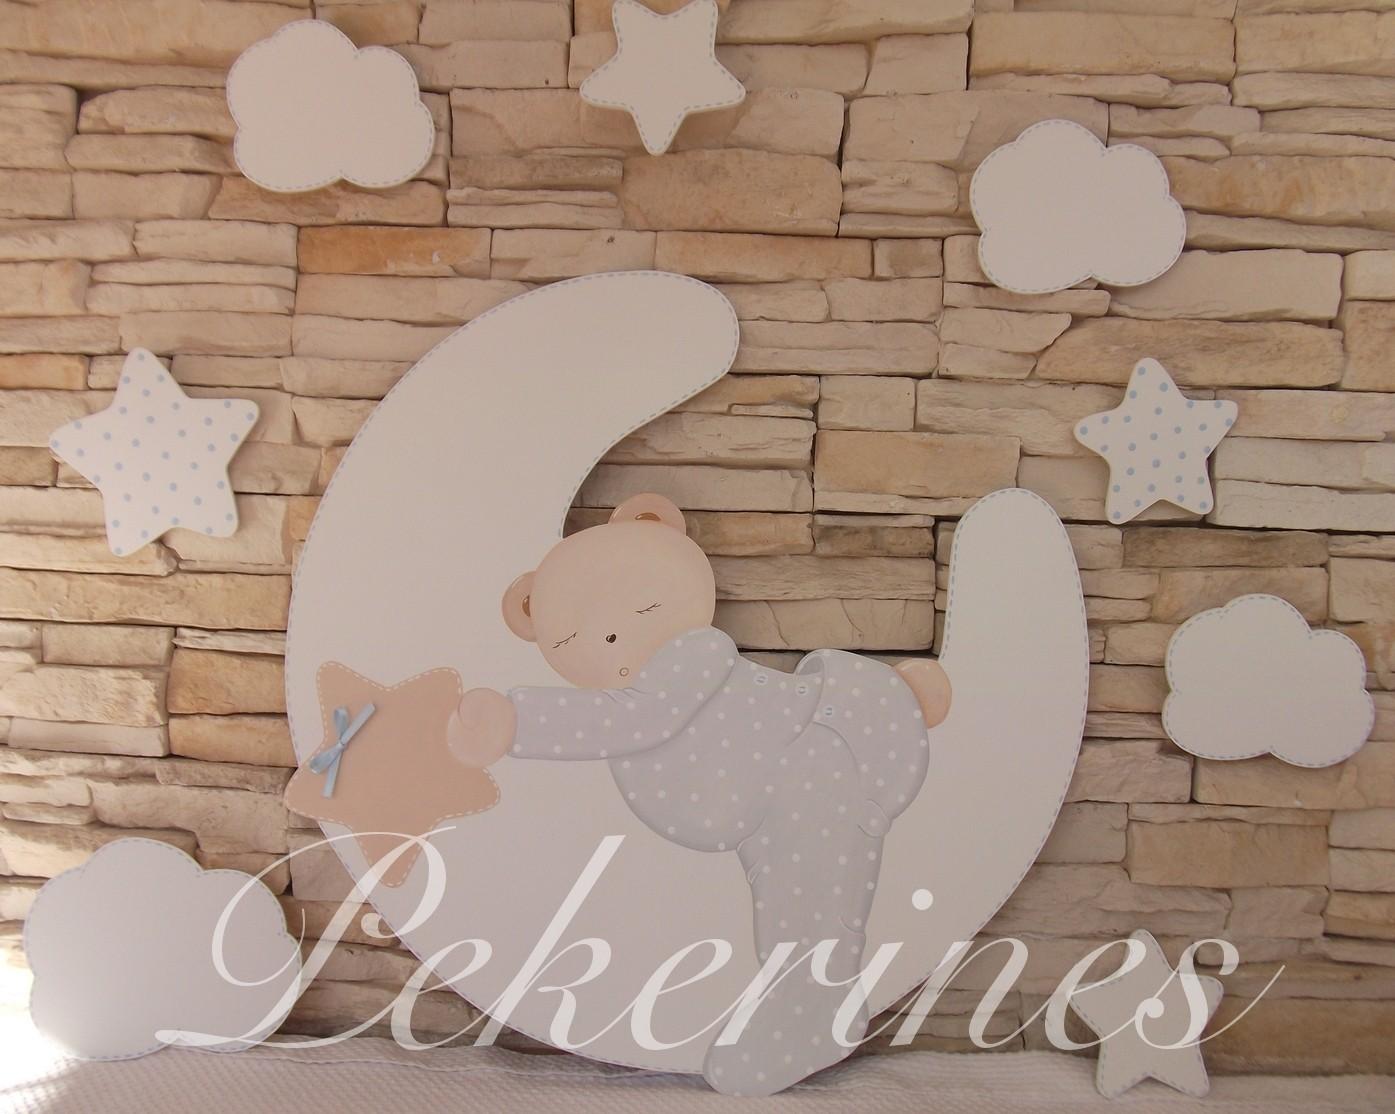 Decoraci n infantil pekerines siluetas decoraci n - Decoracion de habitacion de bebe nina ...